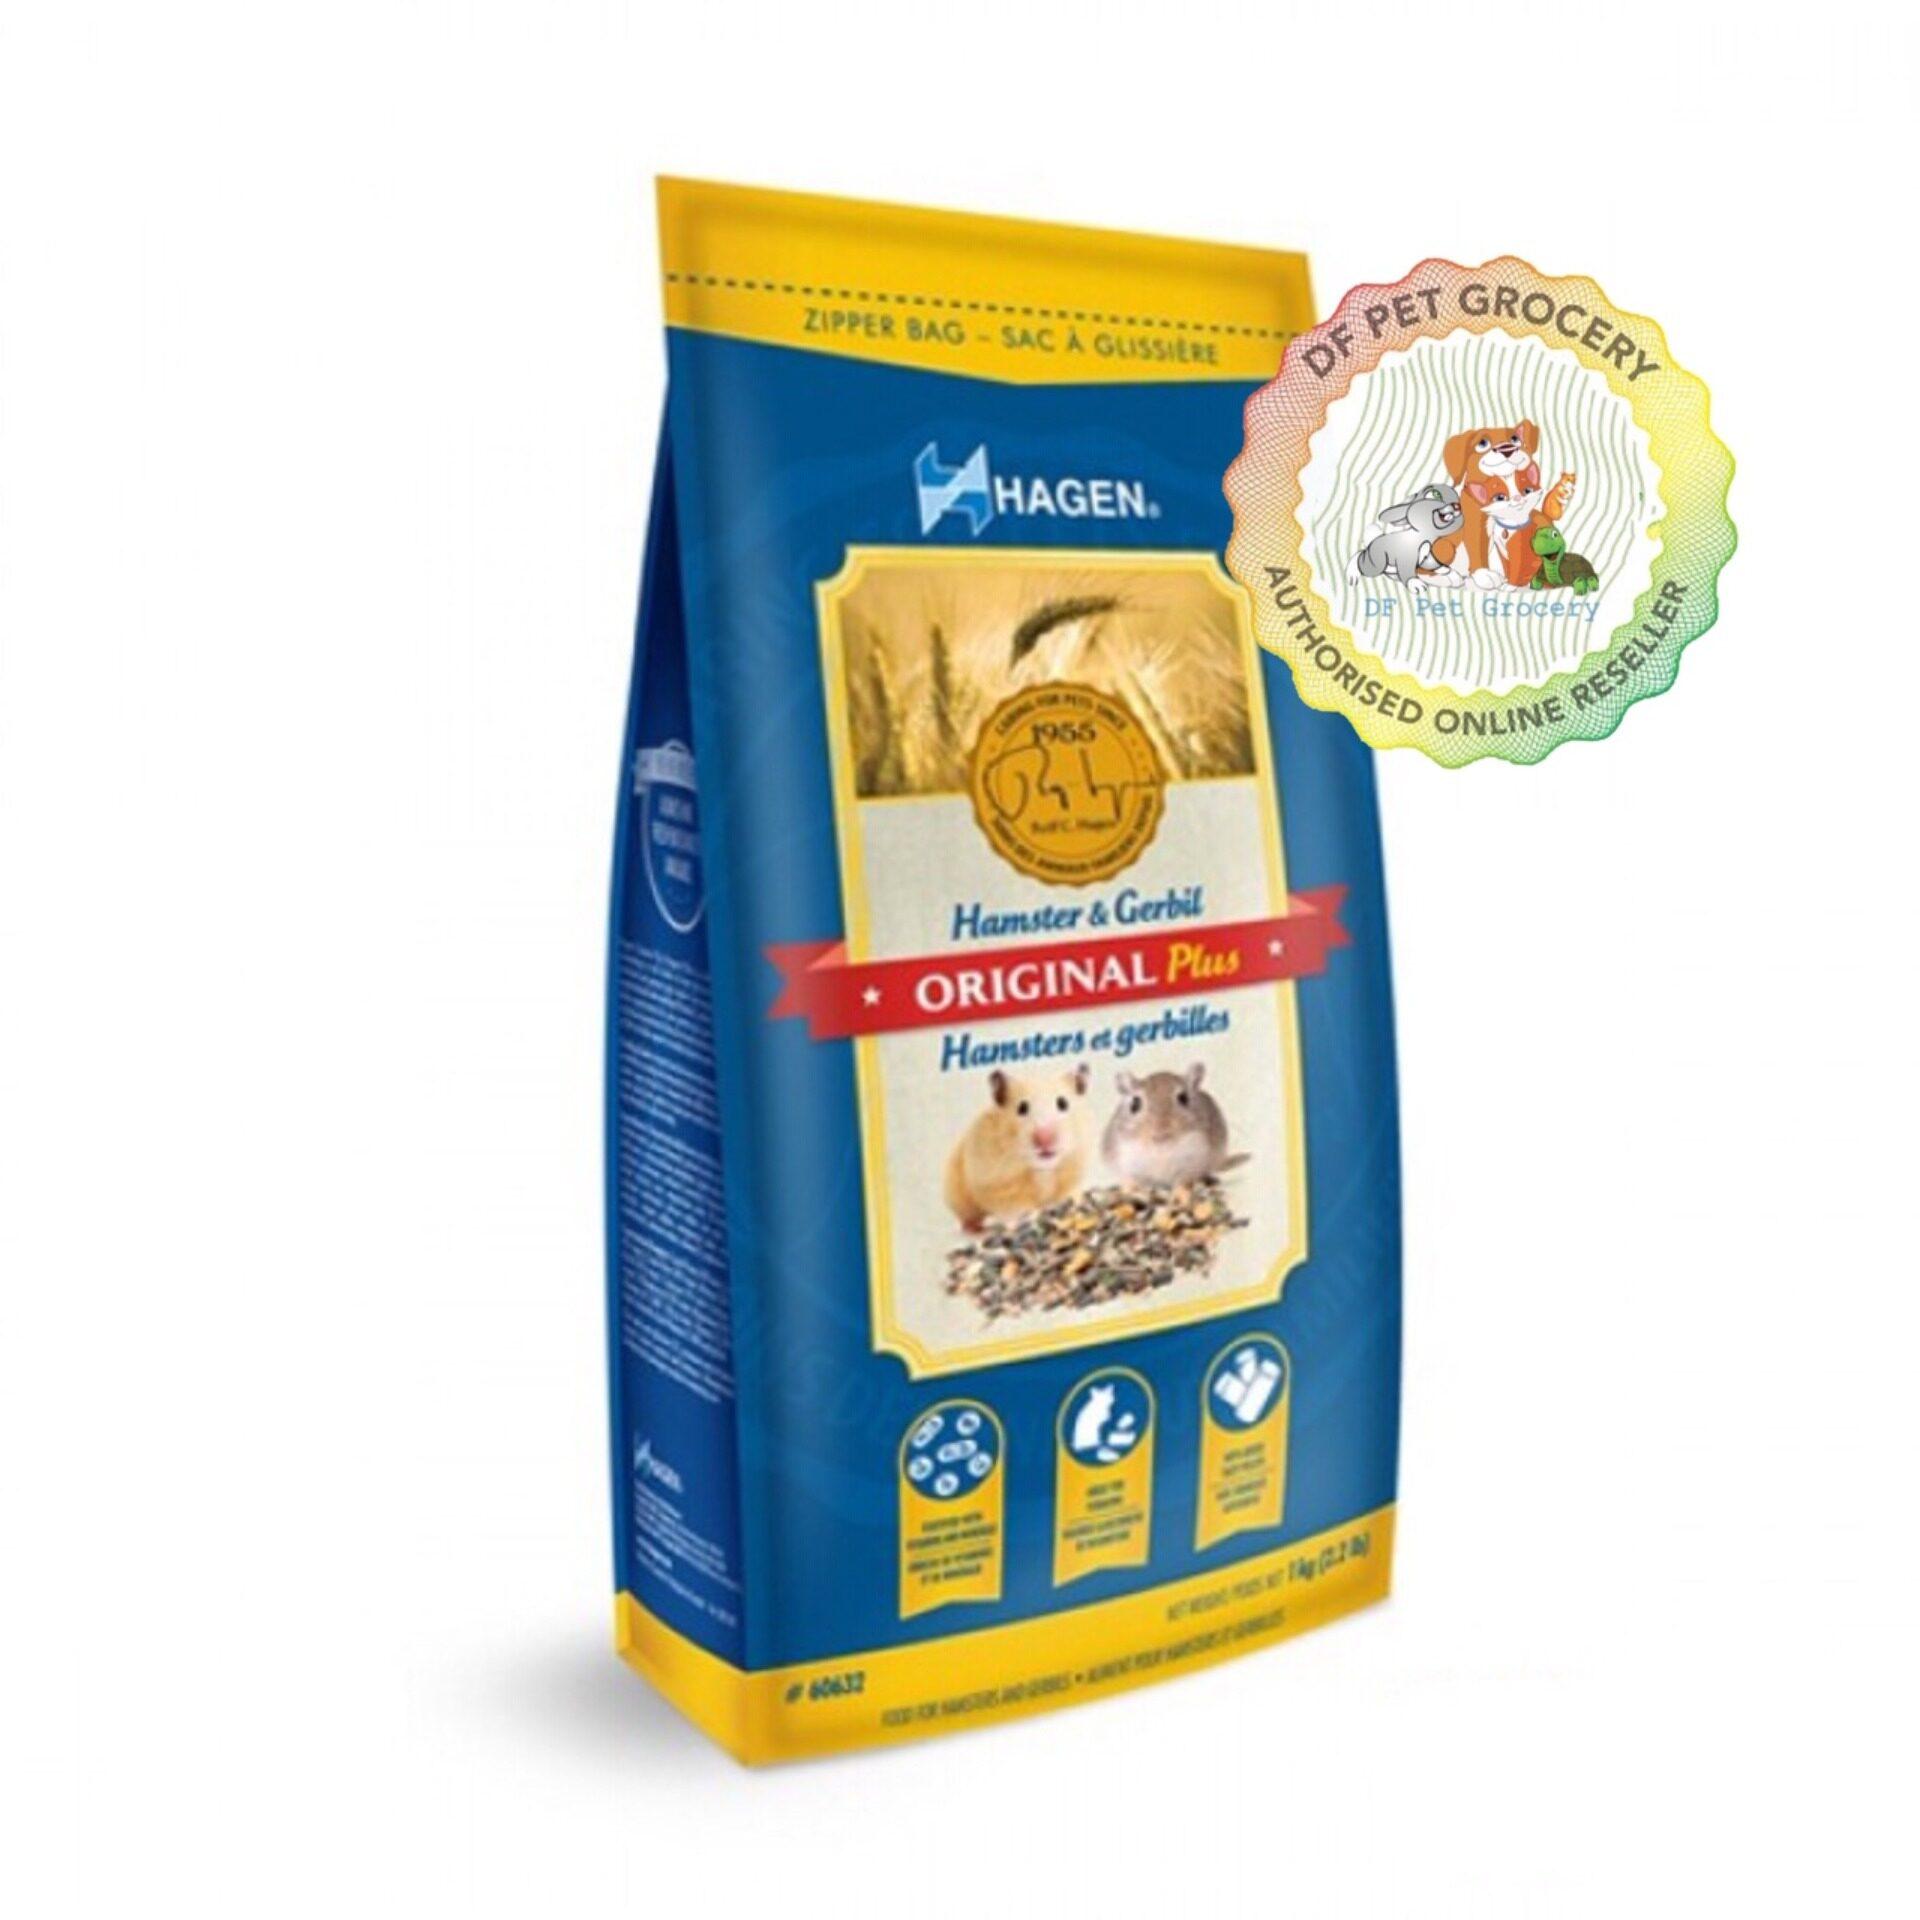 Hagen Original Plus Hamster & Gerbil Food - 1 kg Hamster Food 60632